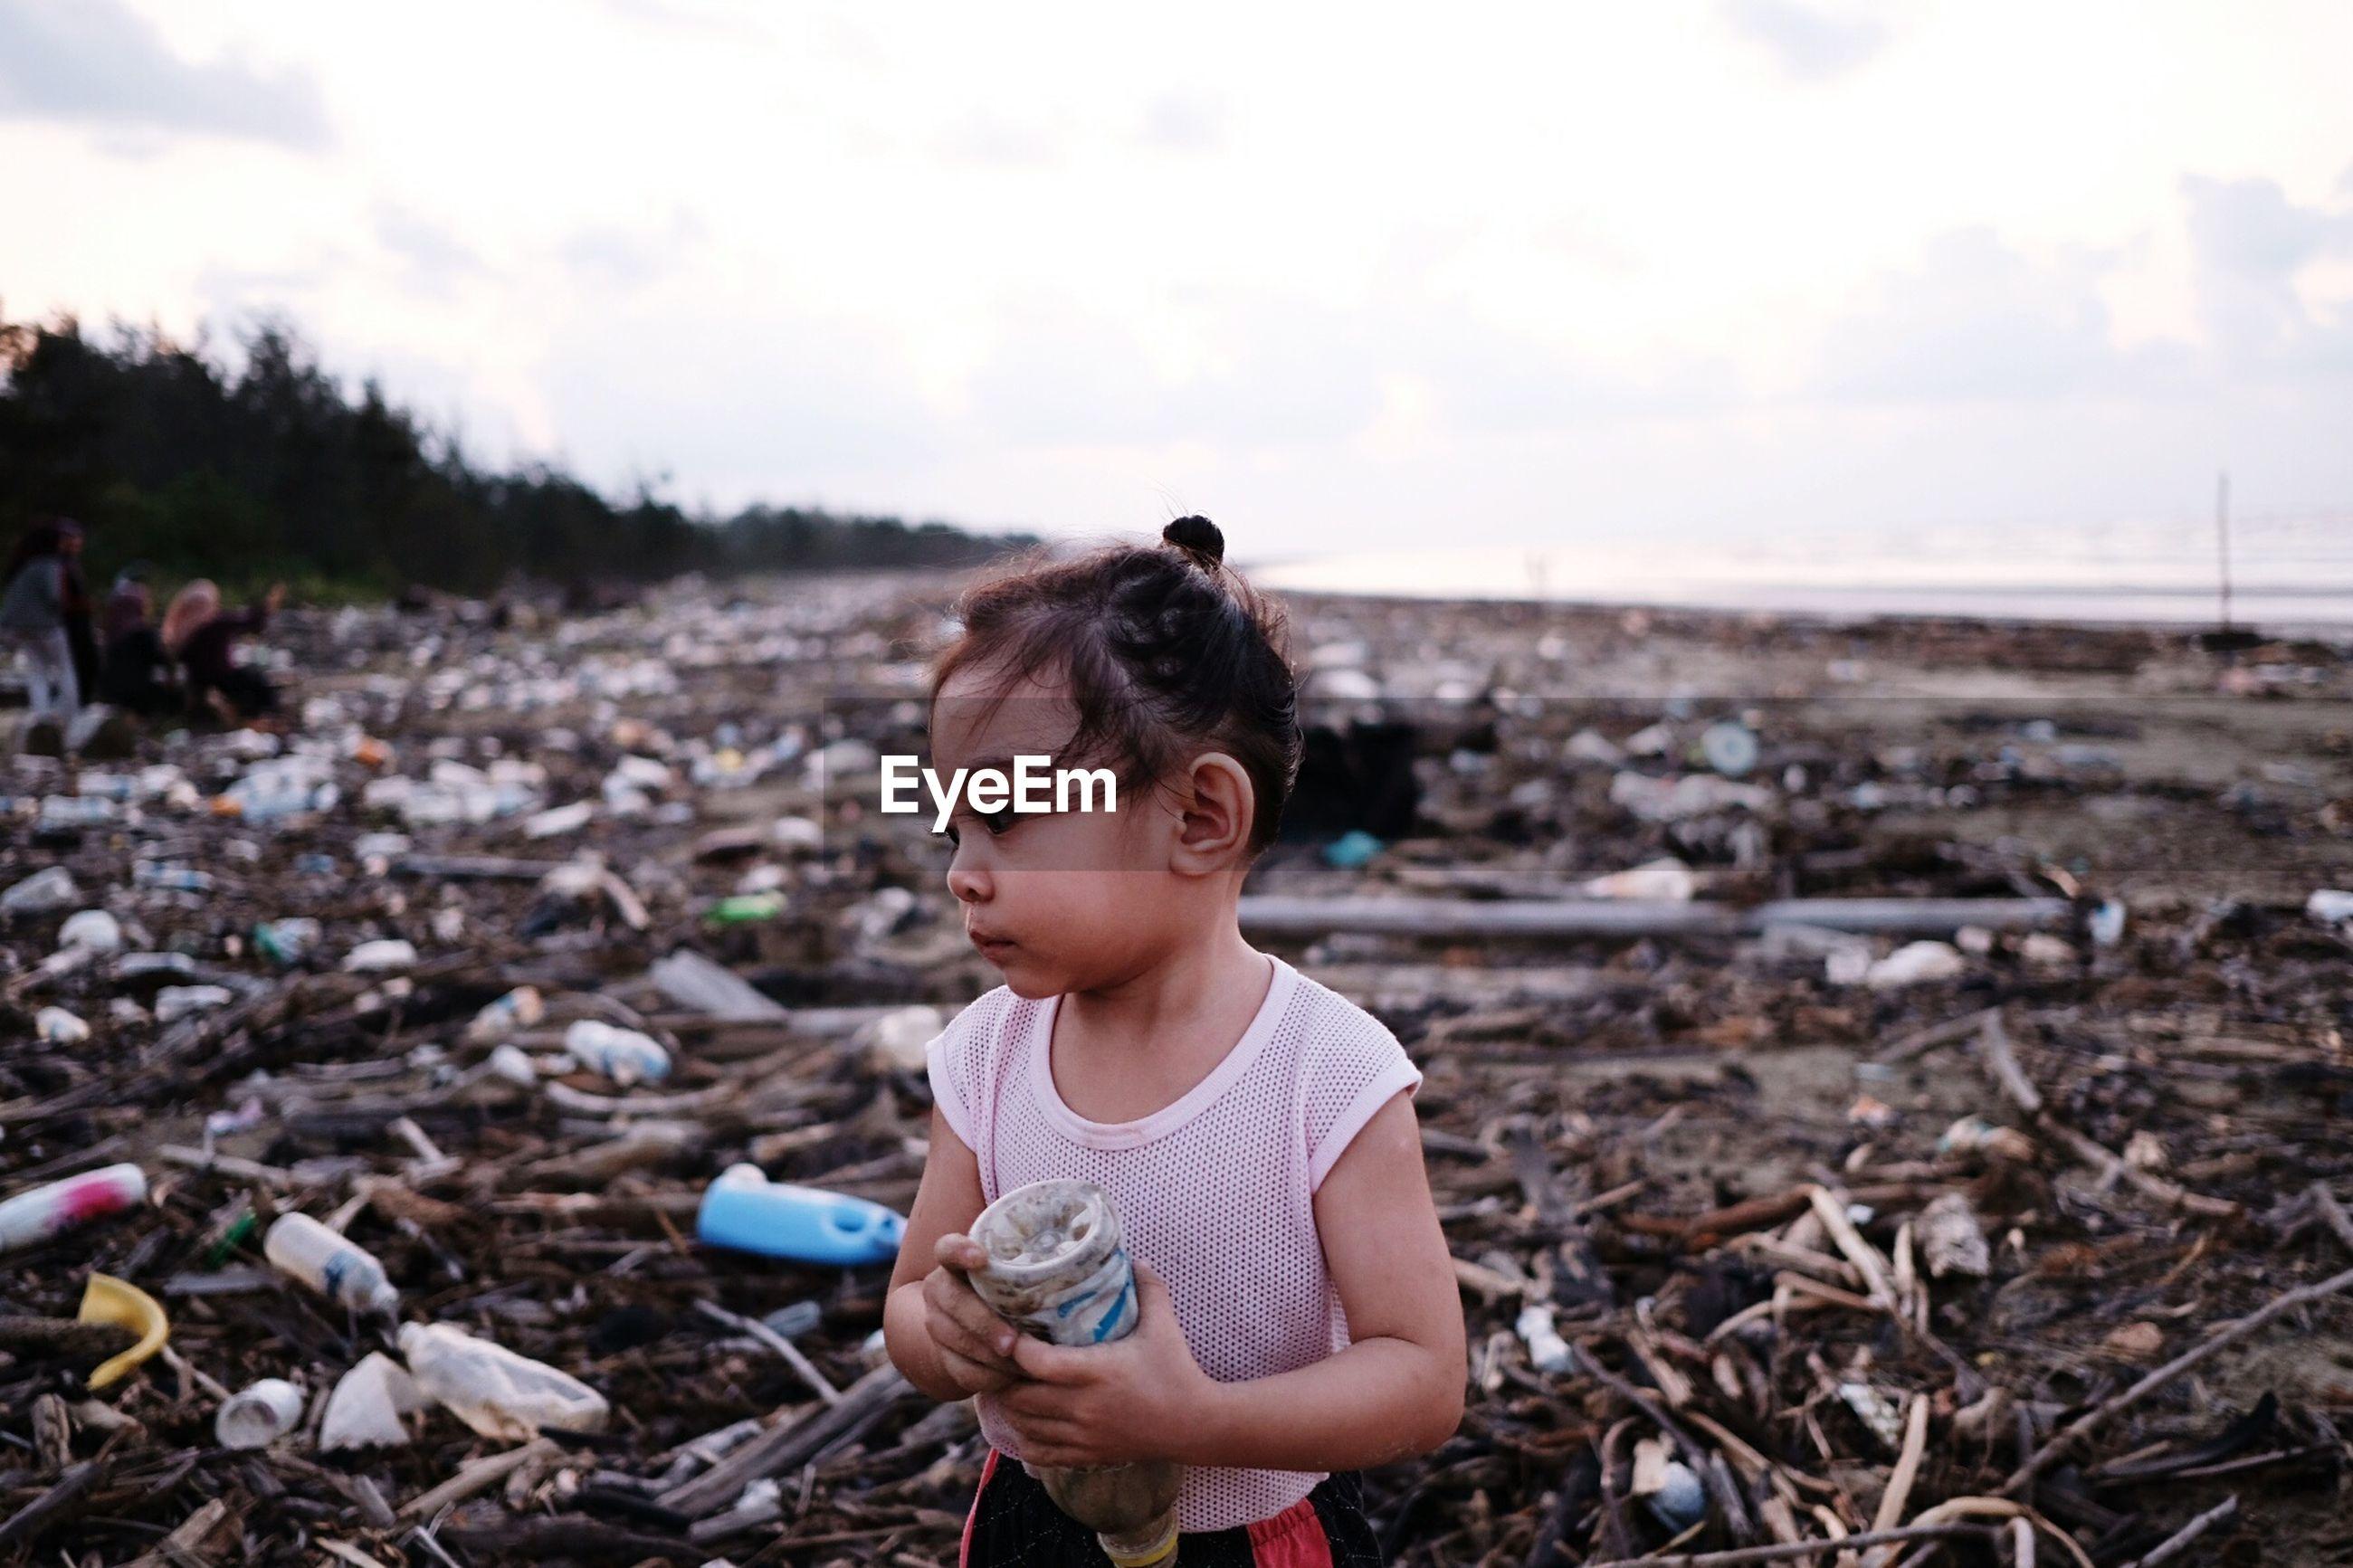 Girl holding bottle at dirty beach